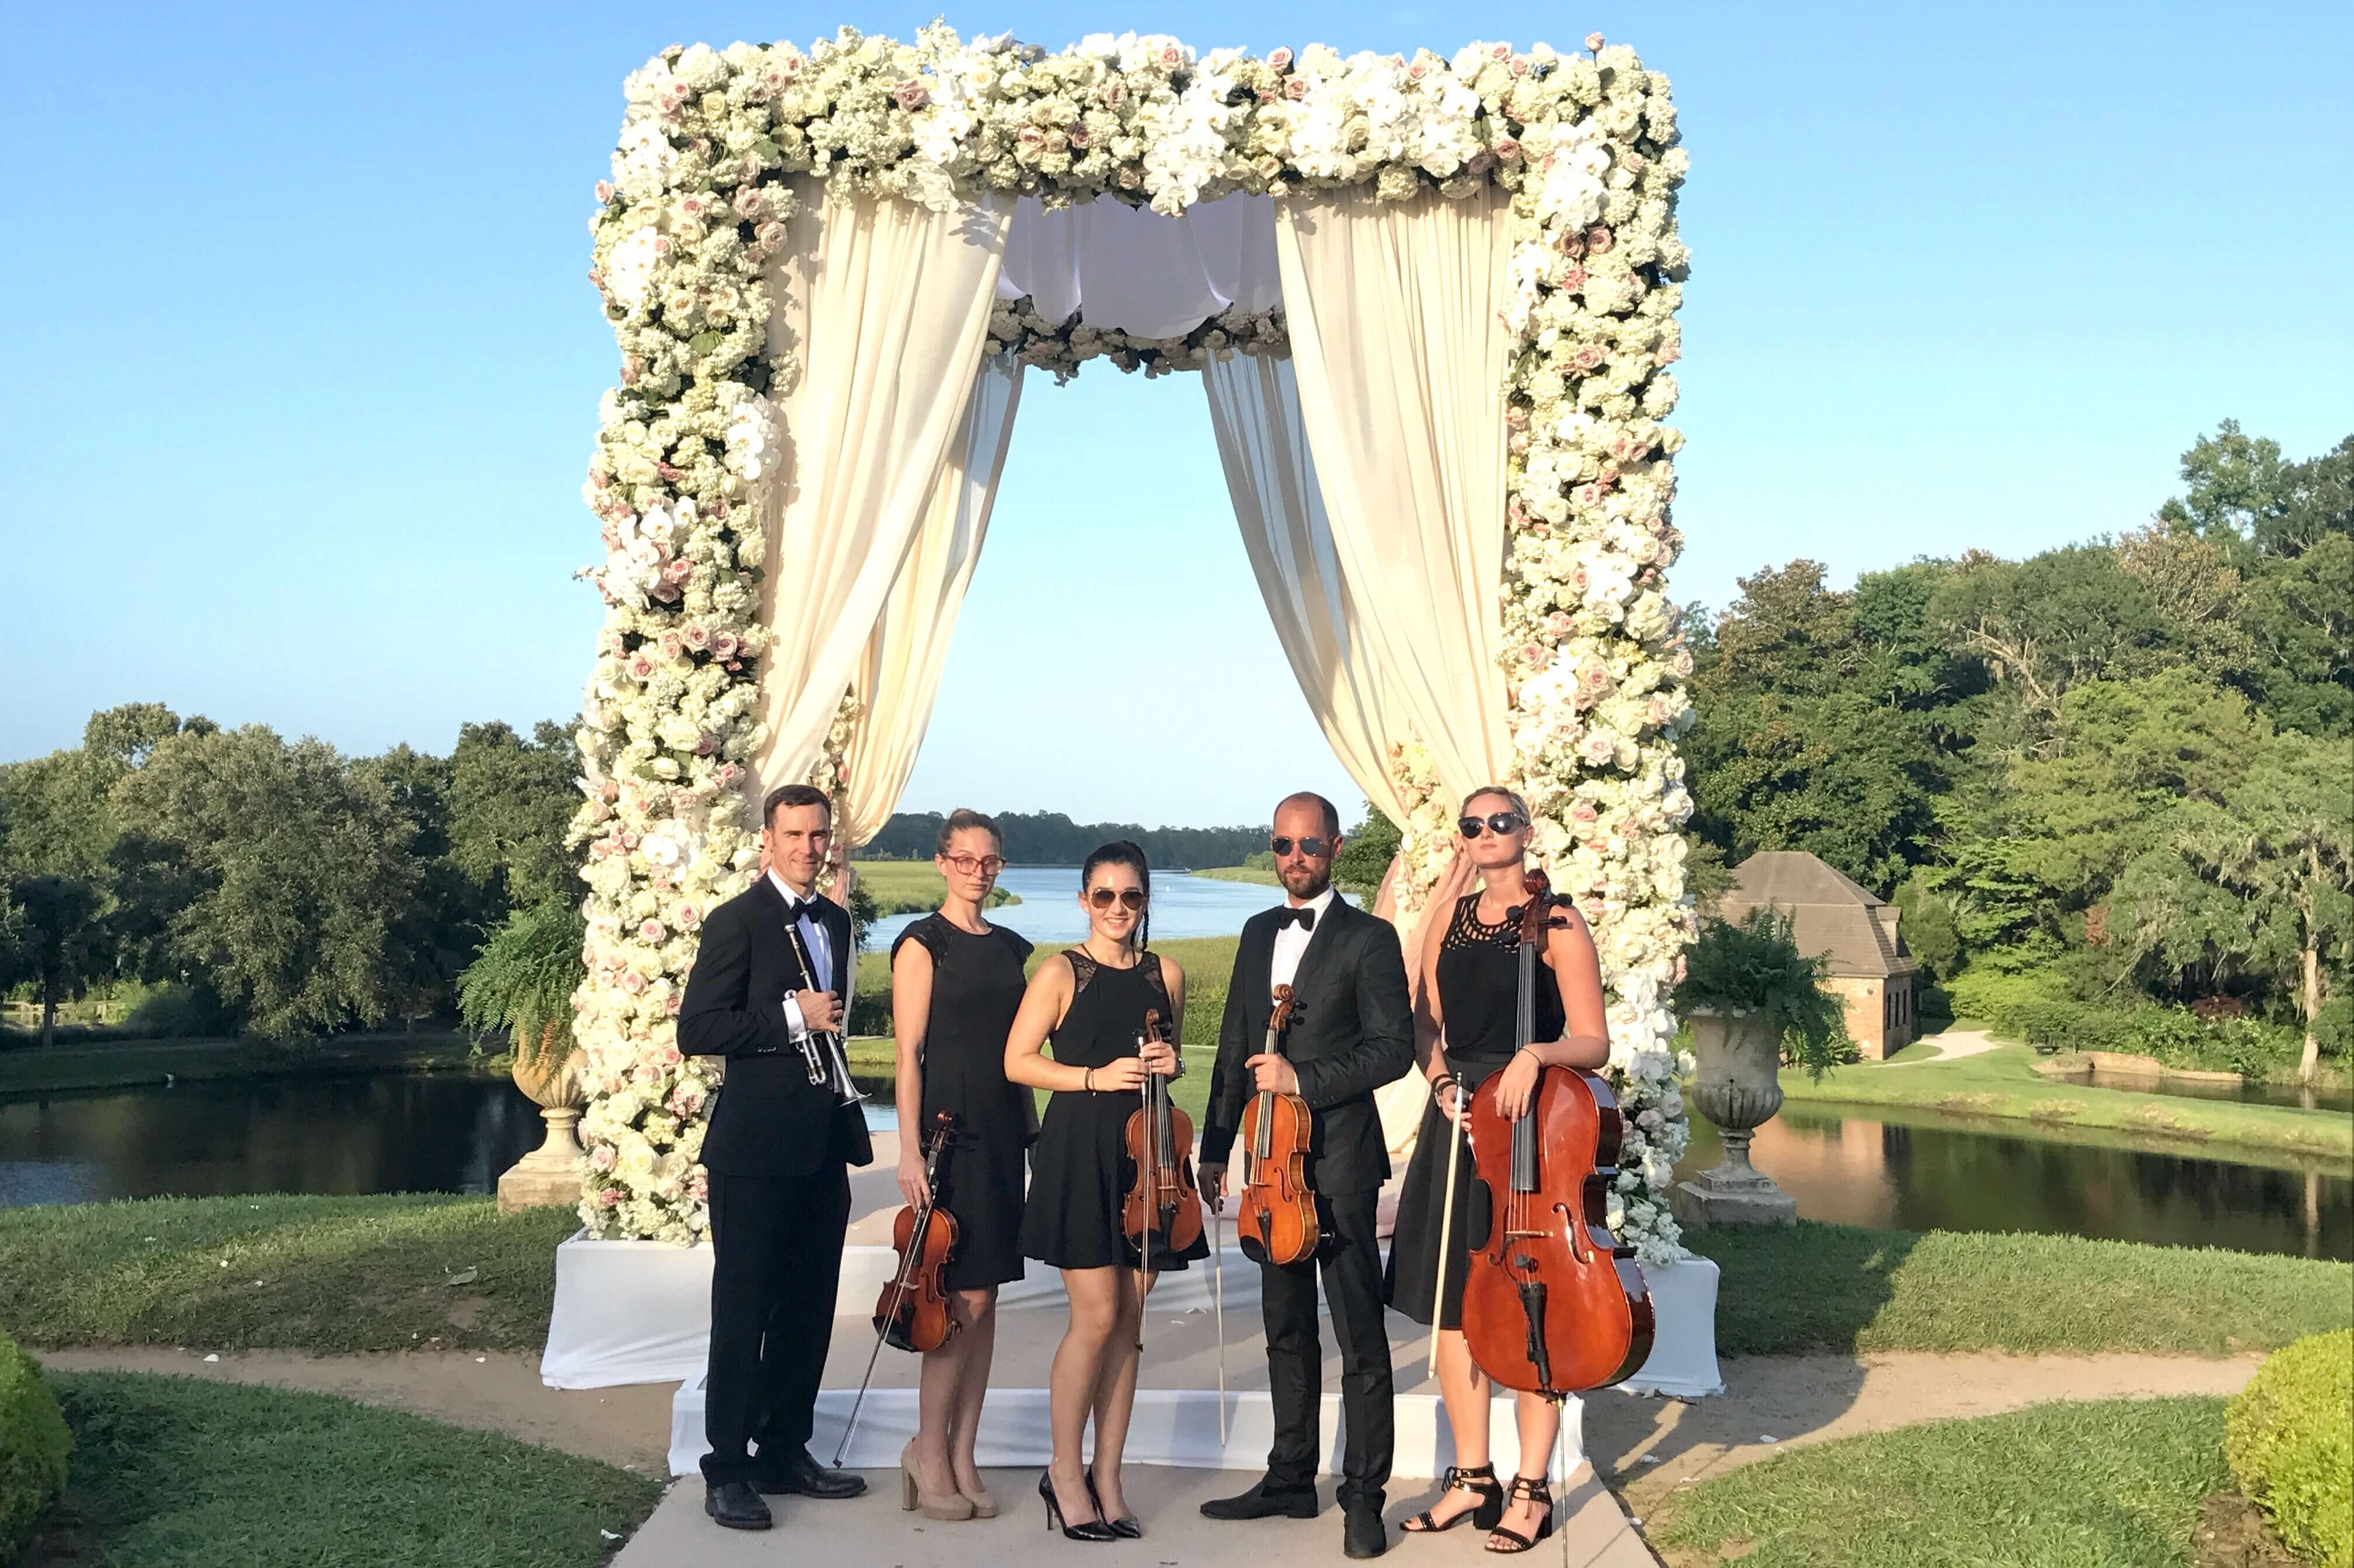 Tara Lipinski Ceremony Musicians New York Virtuosi Nyc Wedding